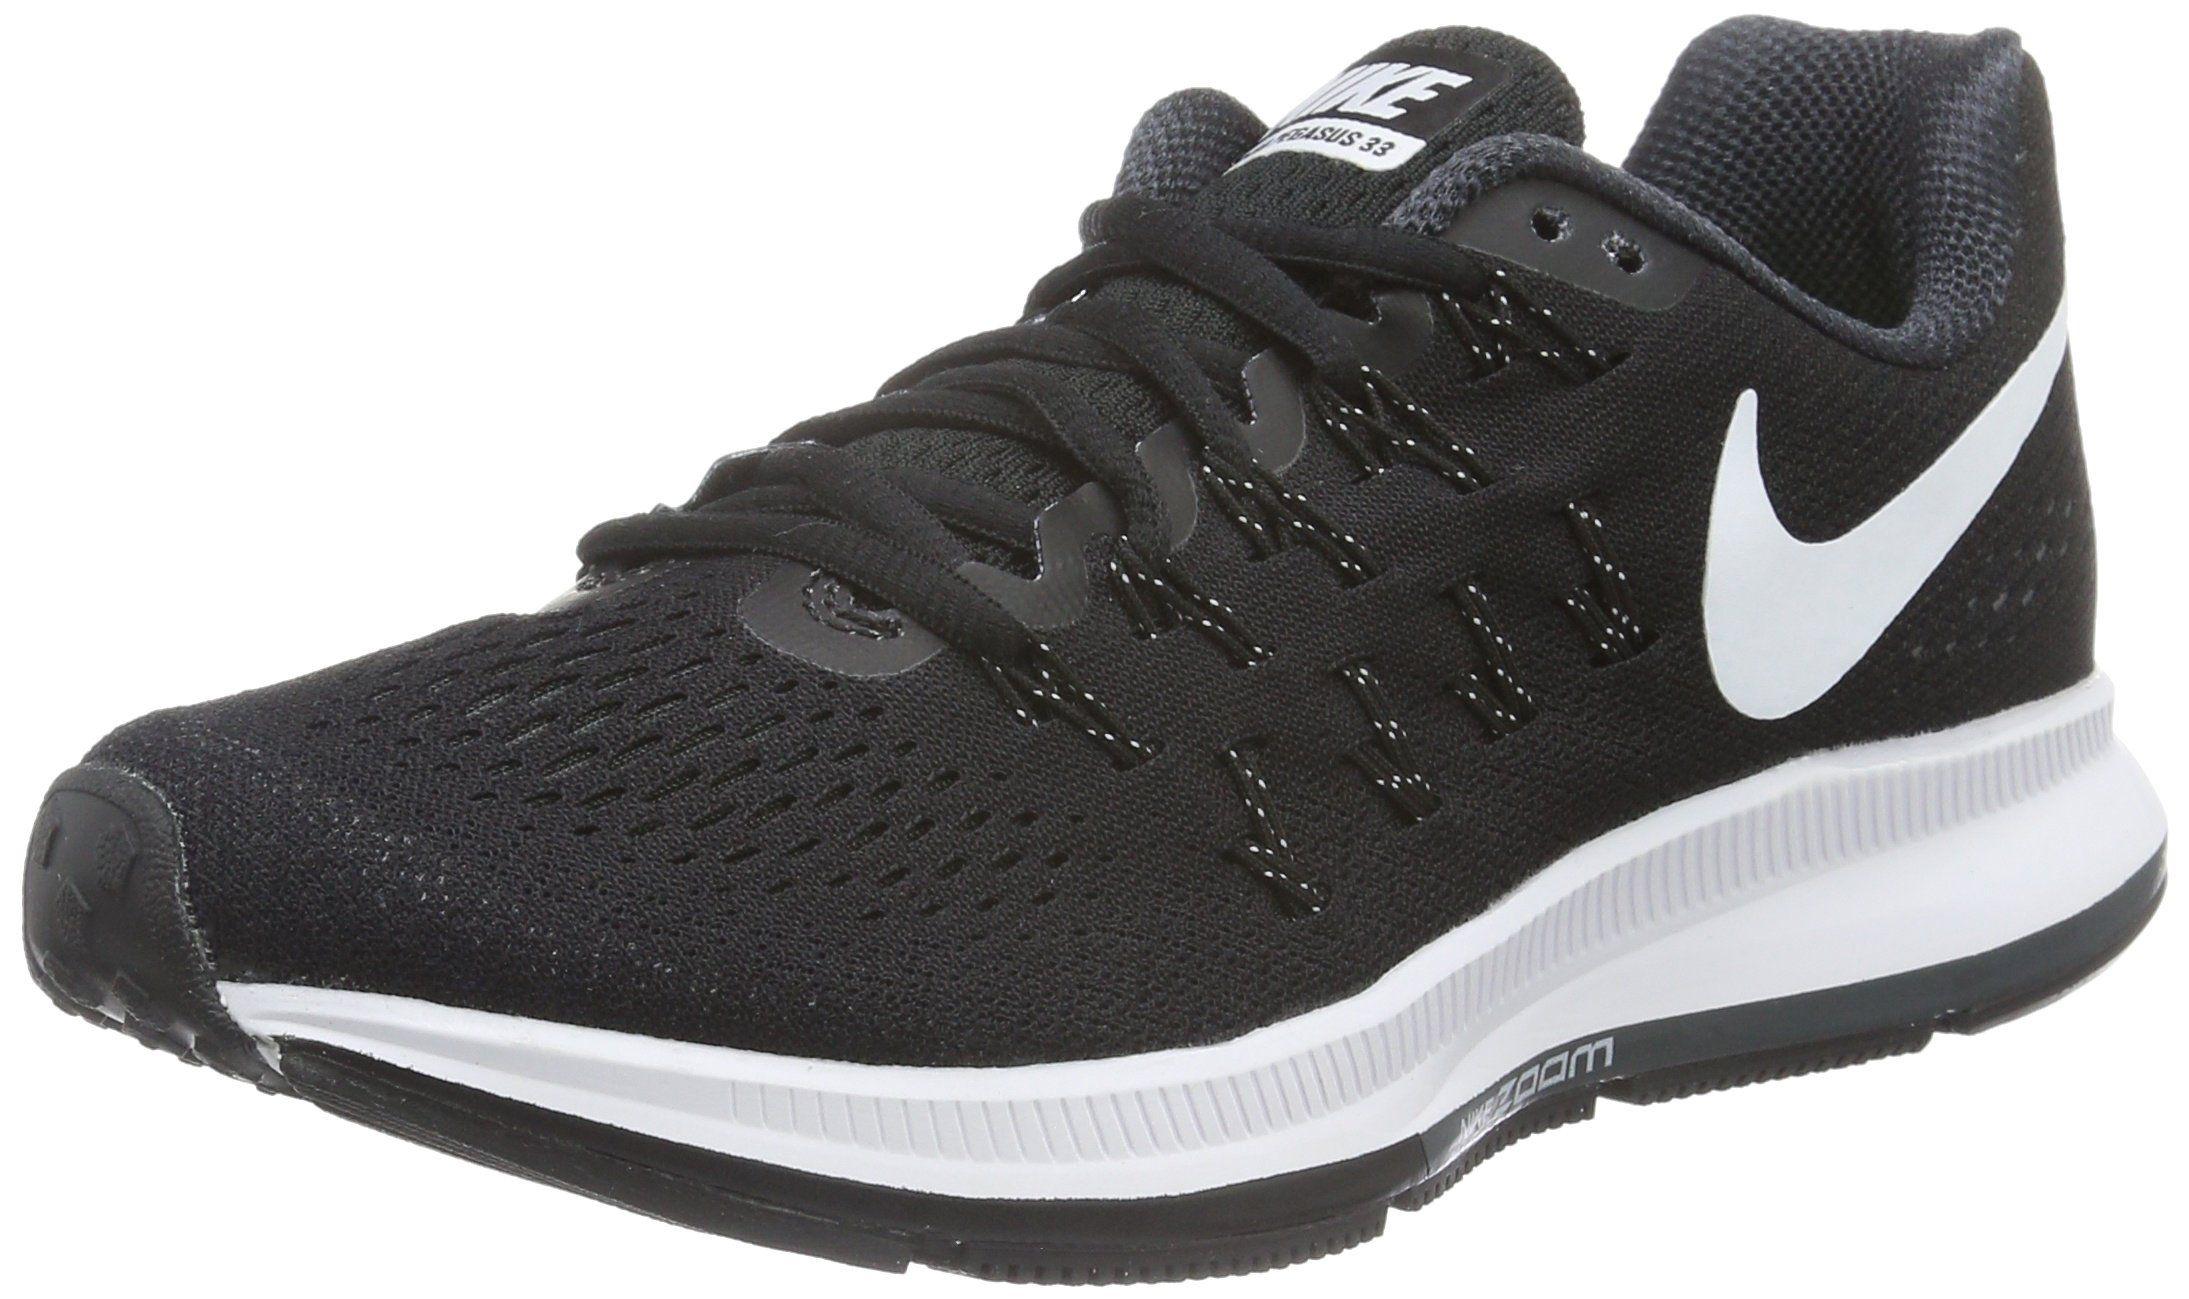 7fc2fb96987 Nike Women s Air Zoom Pegasus 33 Running Shoe